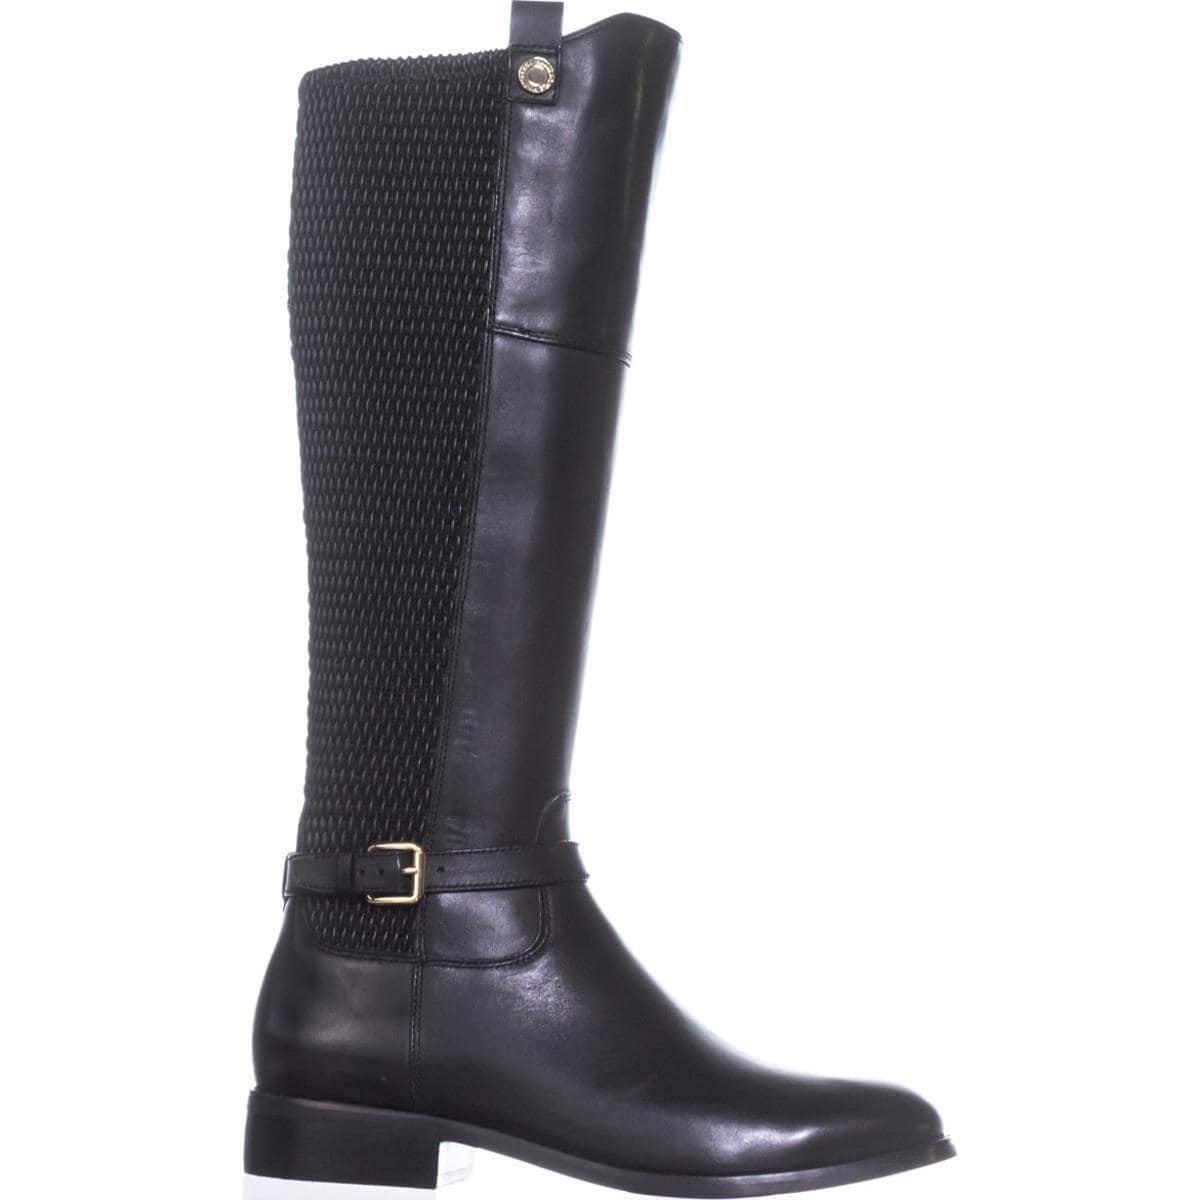 b7a8af79c7d9 Shop Cole Haan Galina Boot Riding Boots